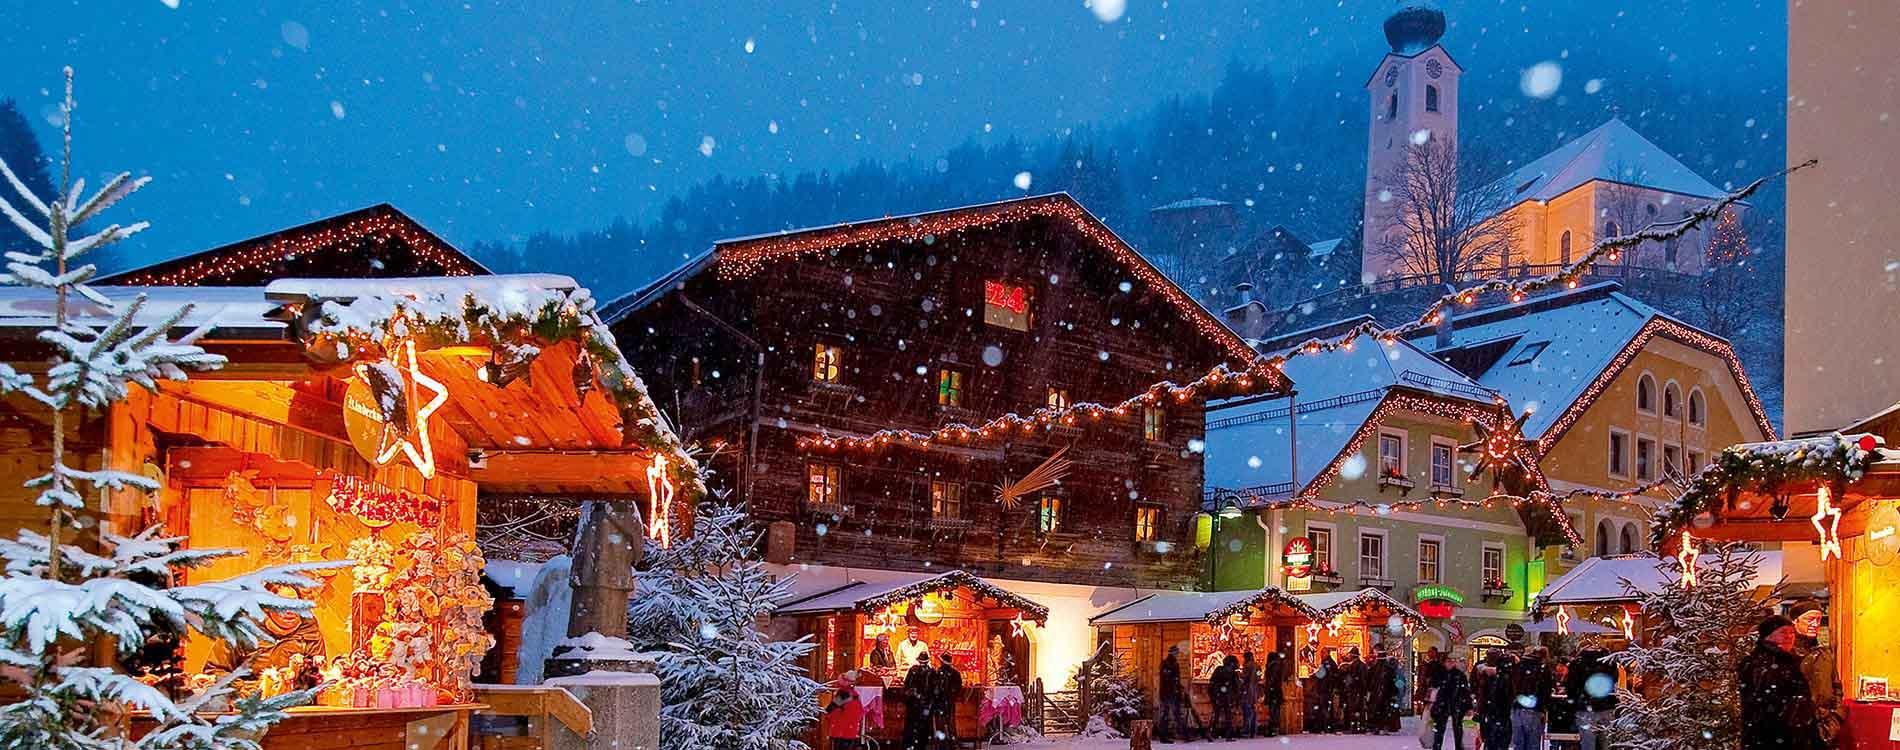 Mountain Christmas - Small Luxury Hotels Grossarler Hof Grossarl Salzburg - Niche Destinations